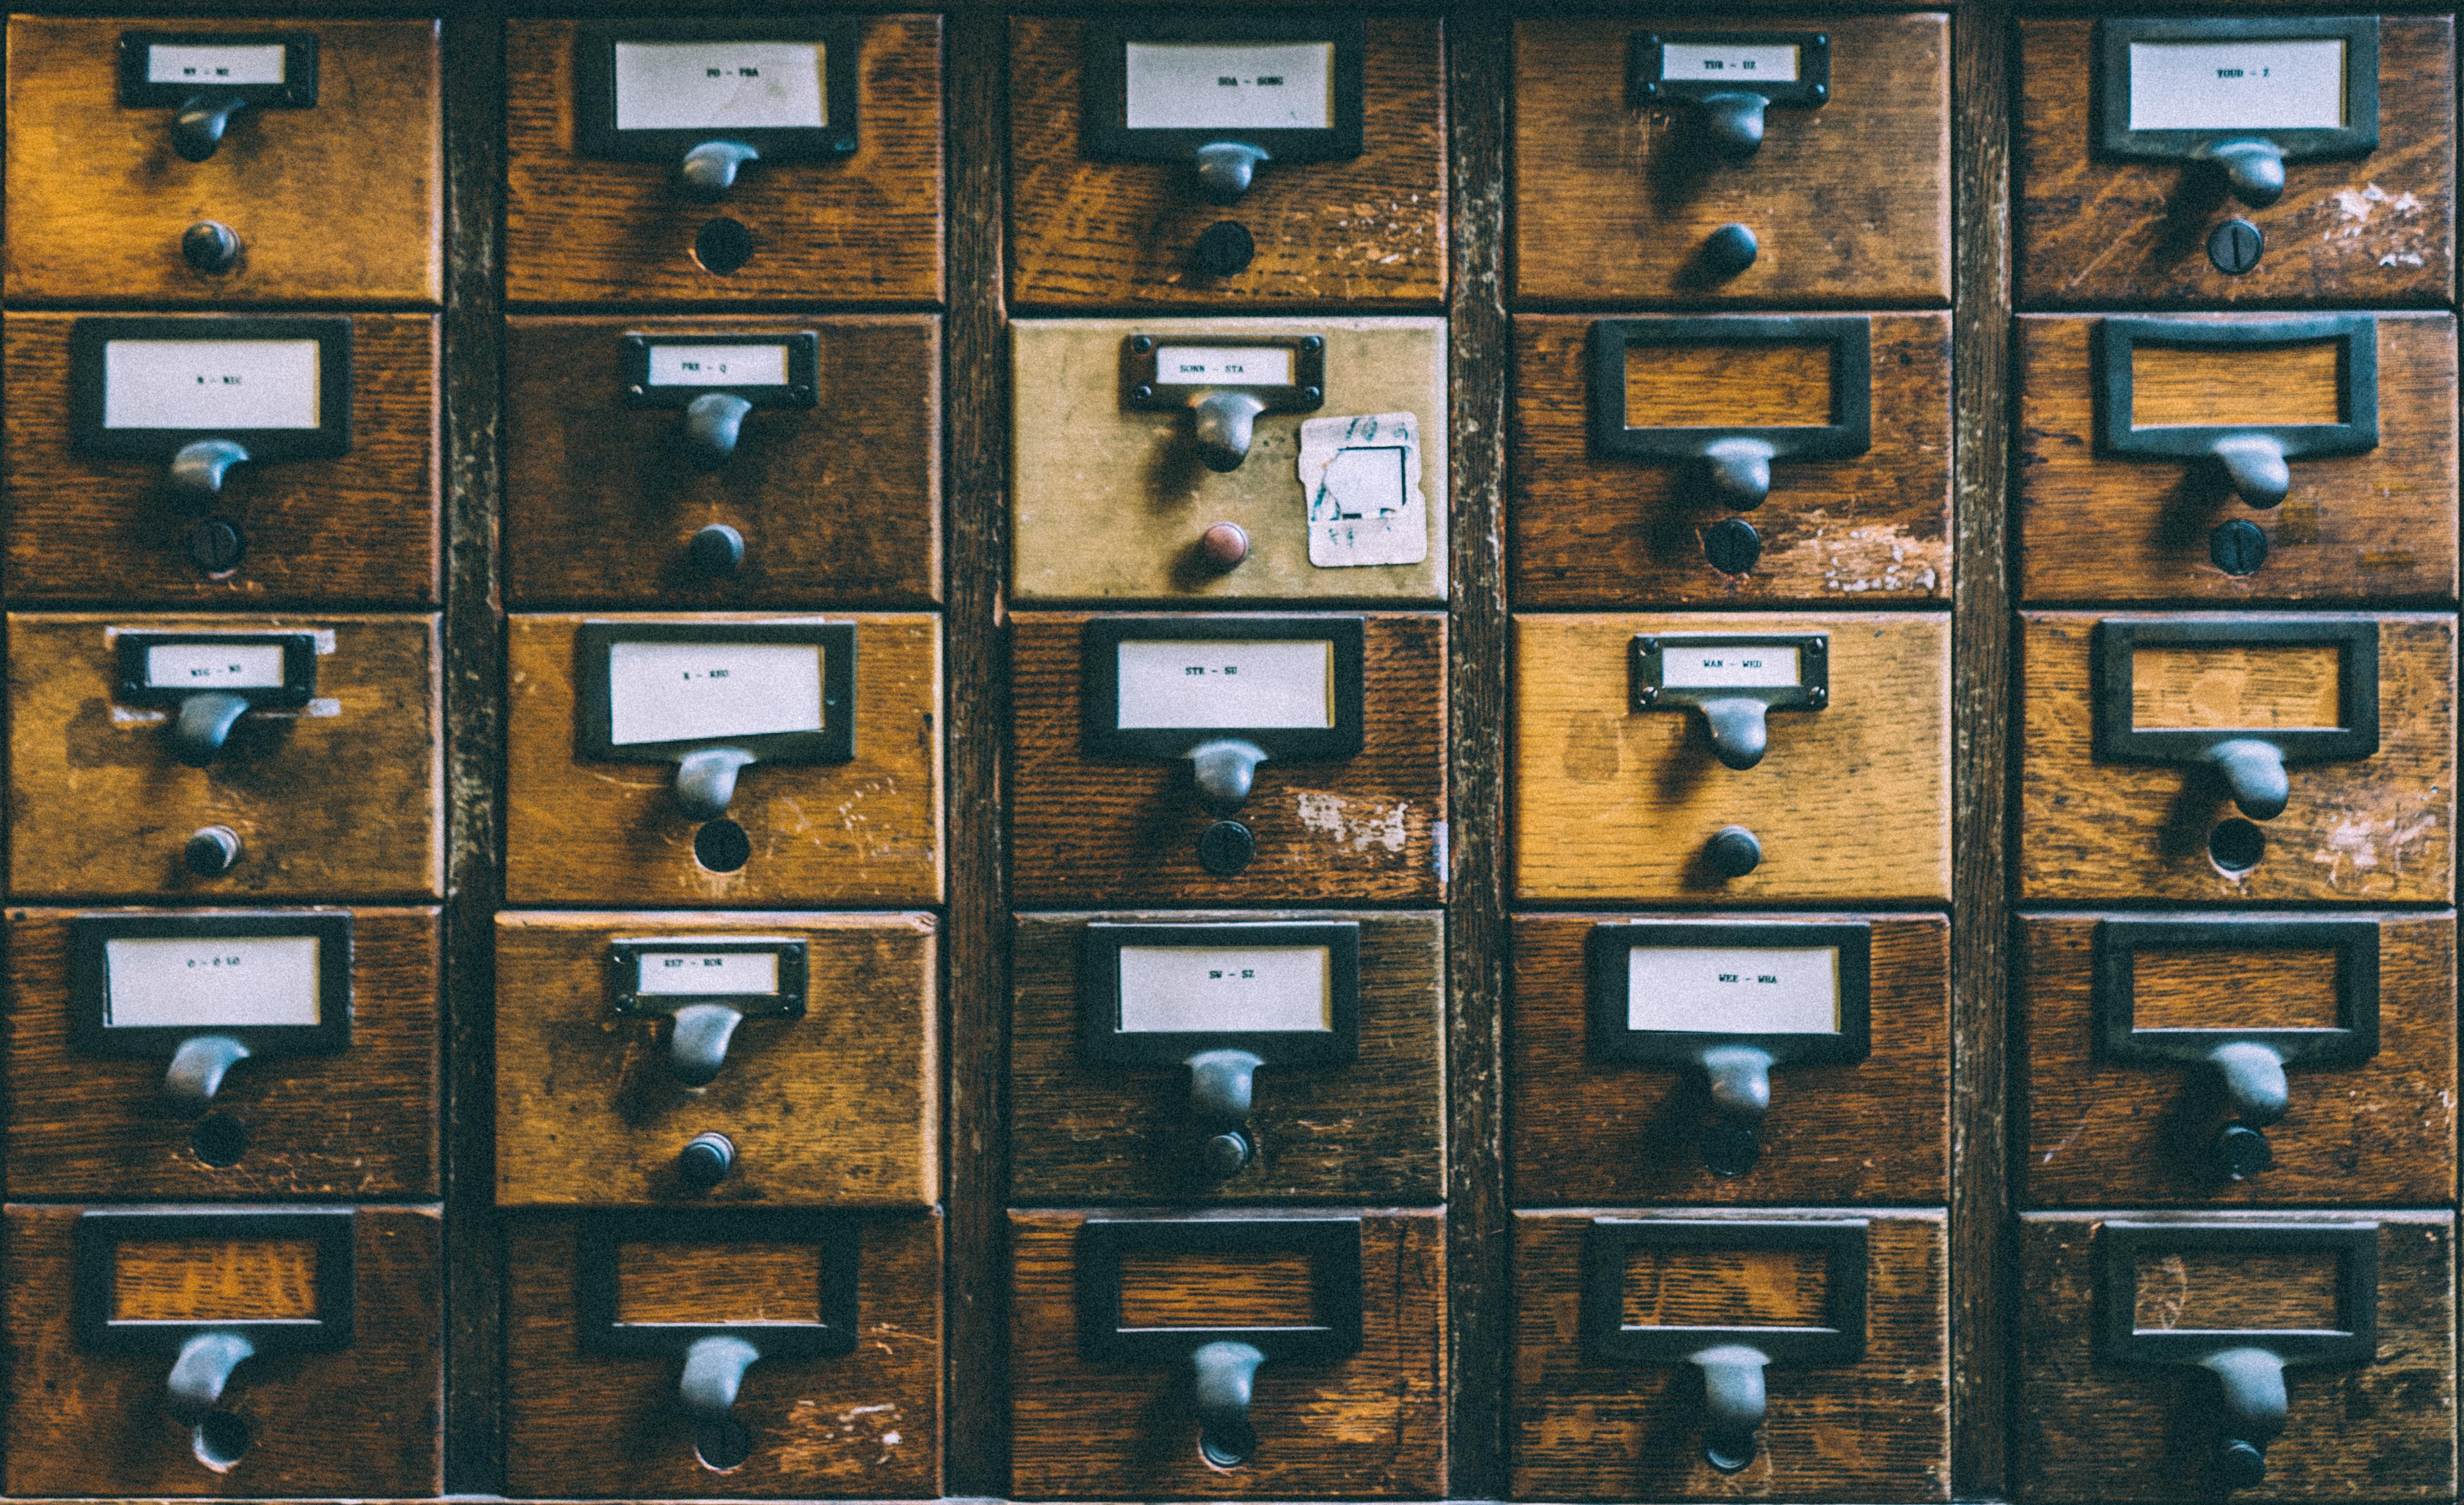 Natural Language Processing can help you make sense of your data